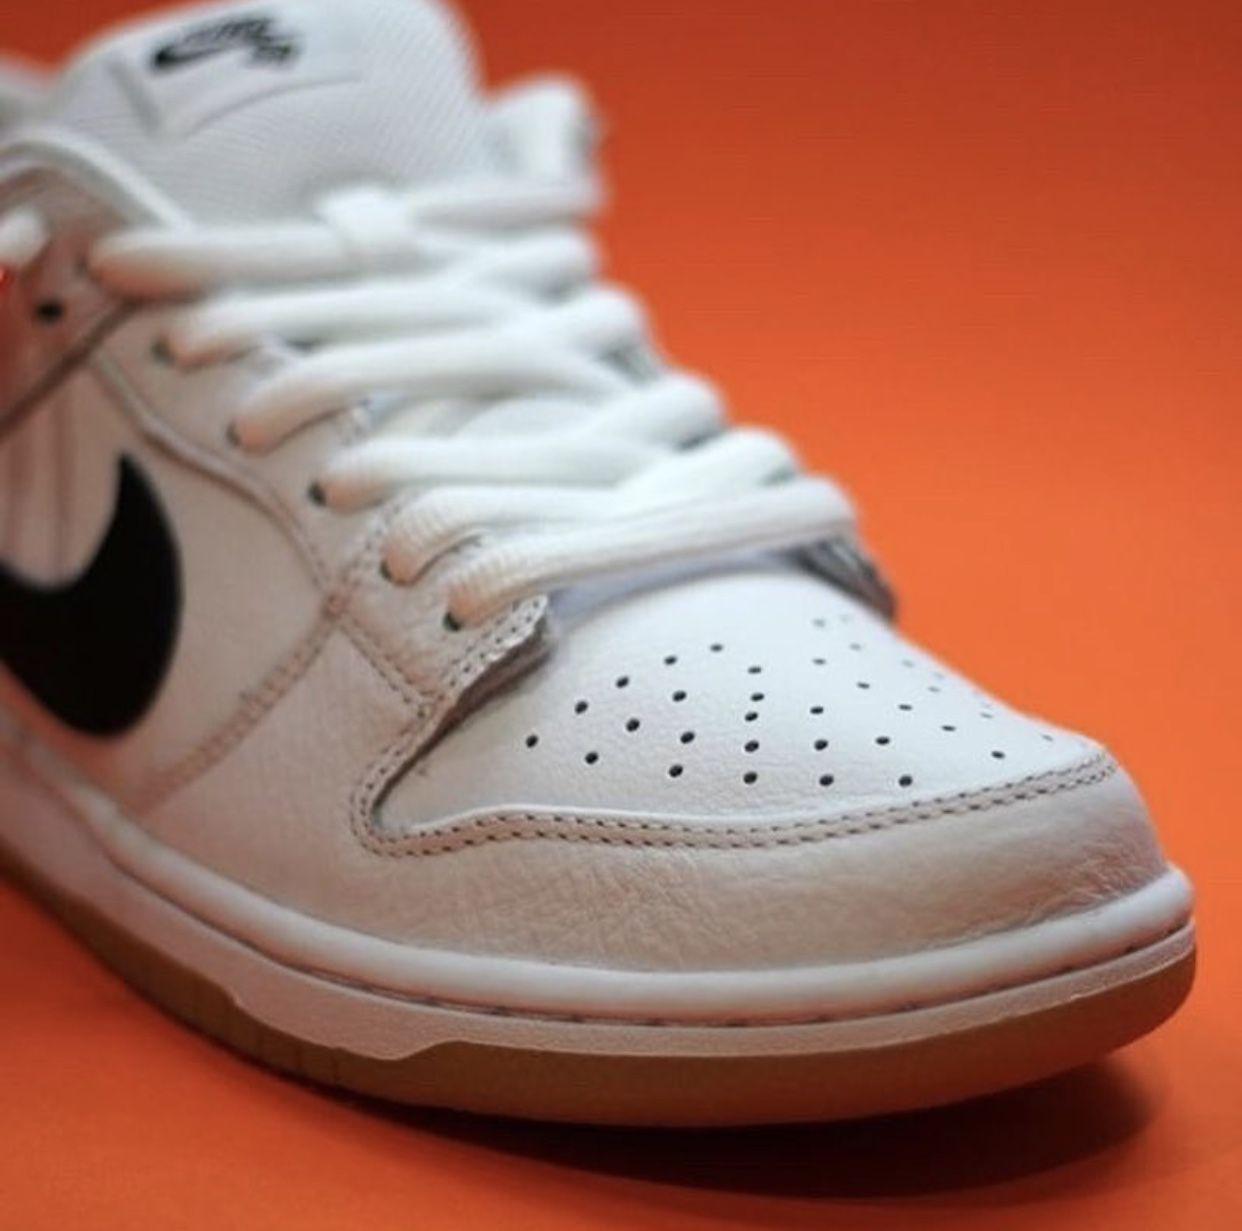 Nike SB Dunk Low Orange Label White Gum